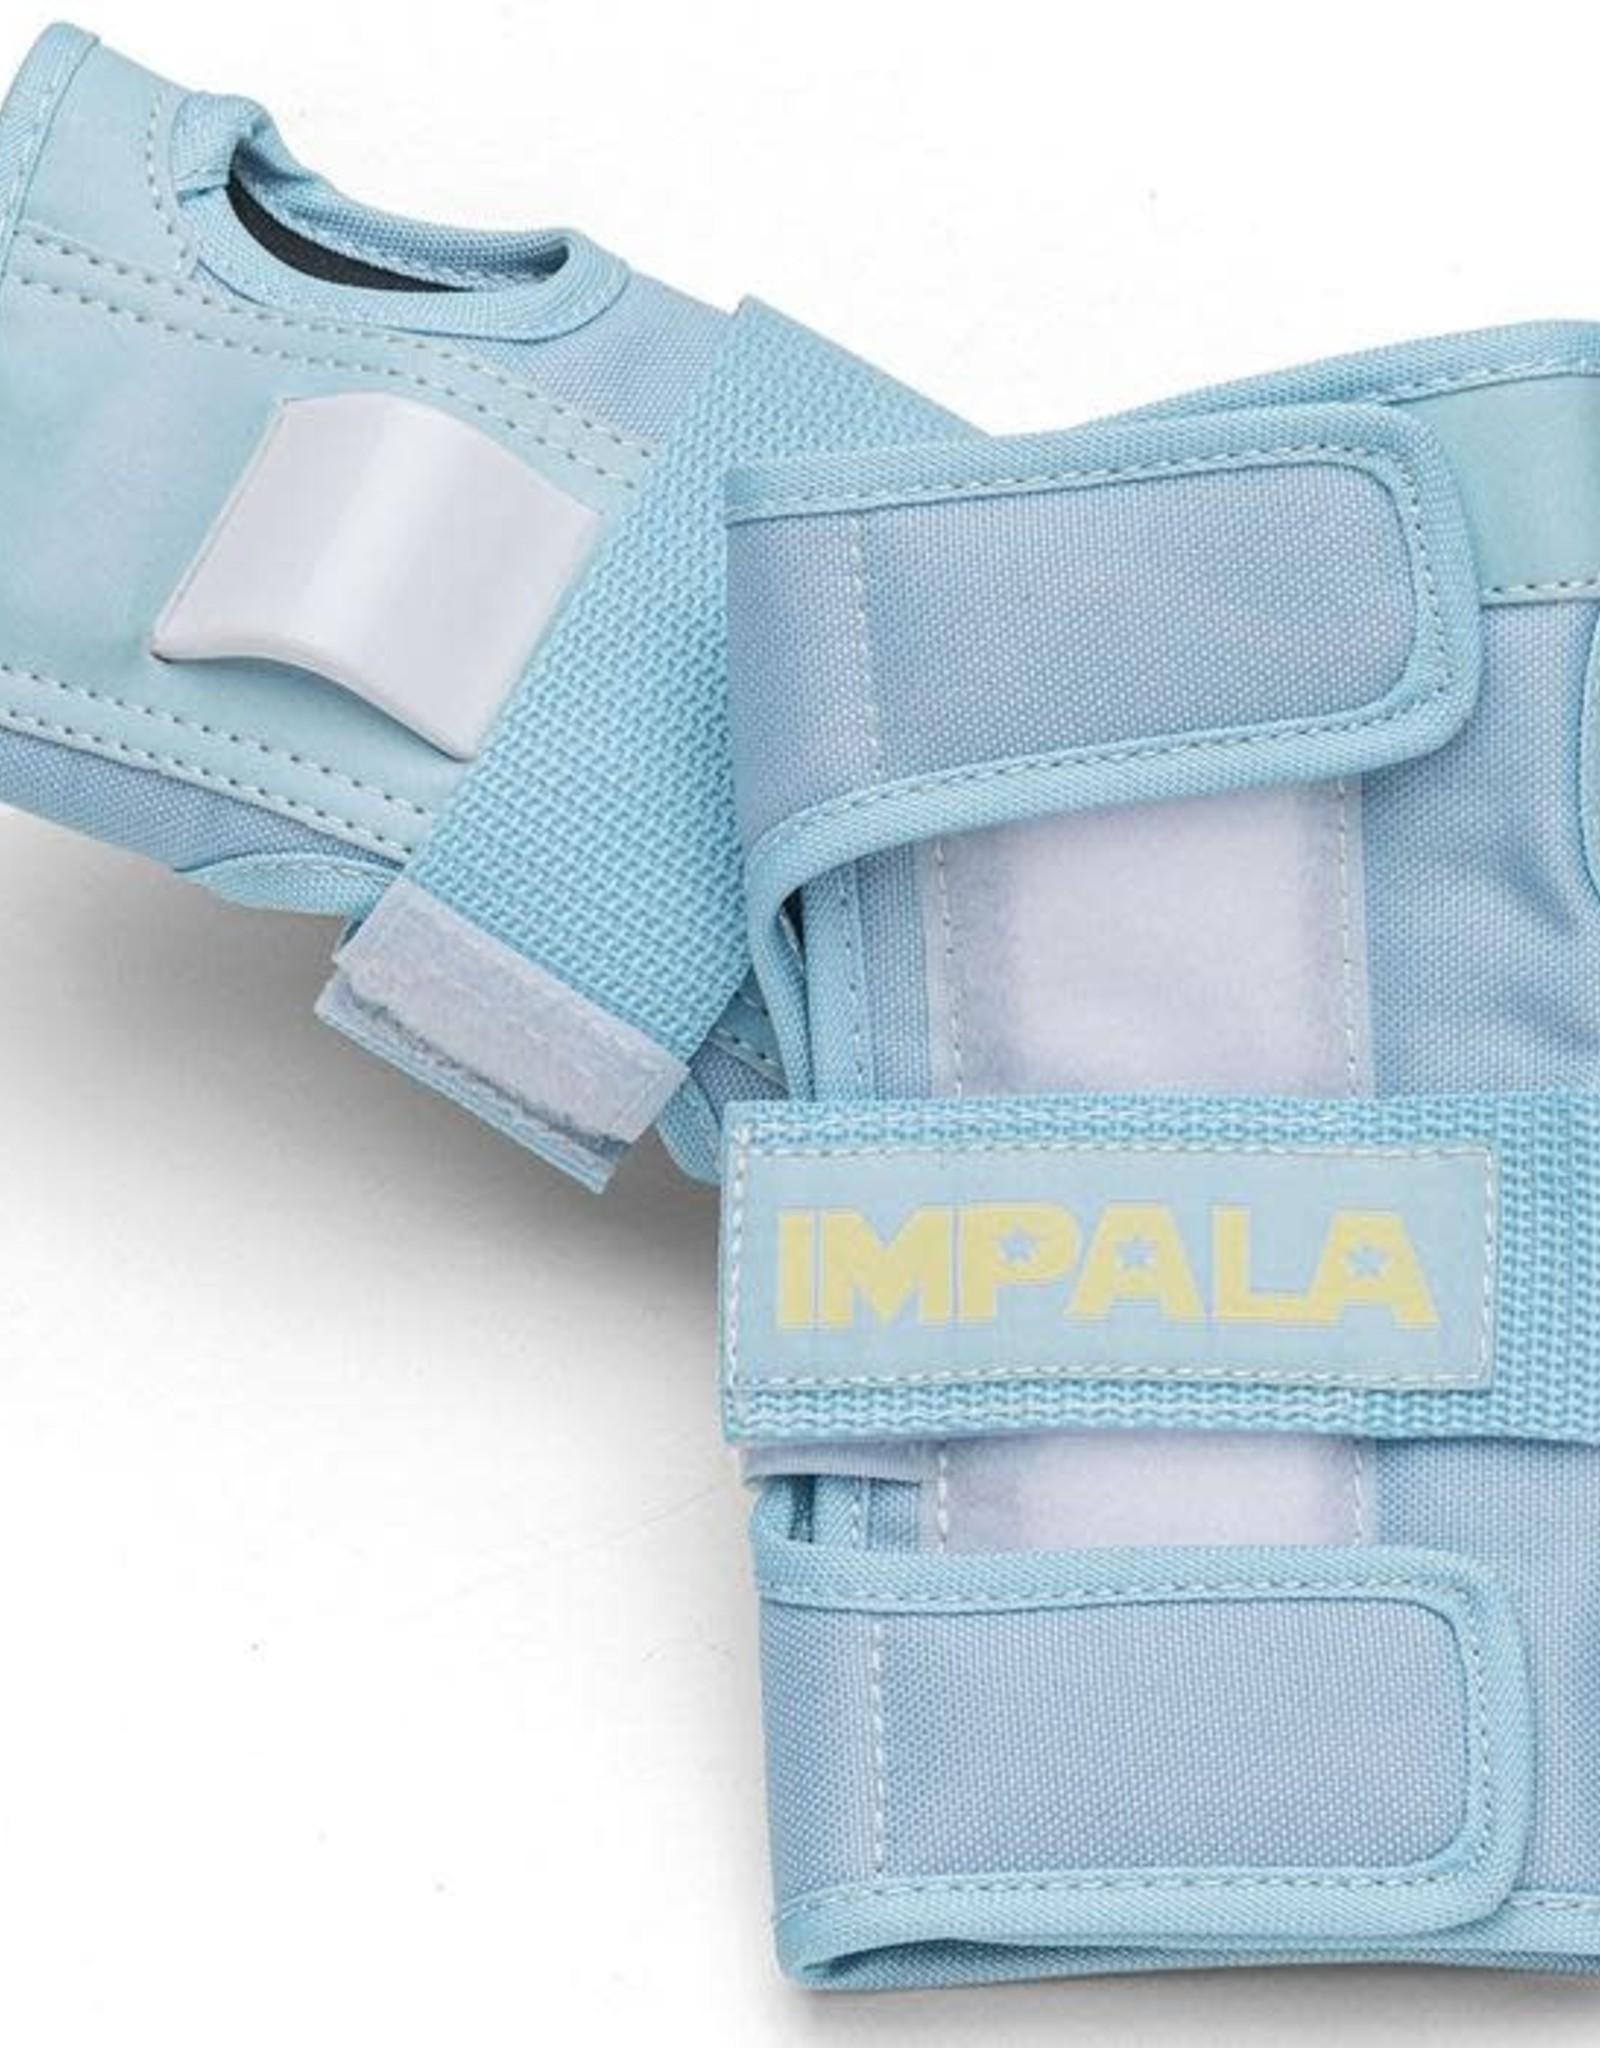 Impala Protective Set